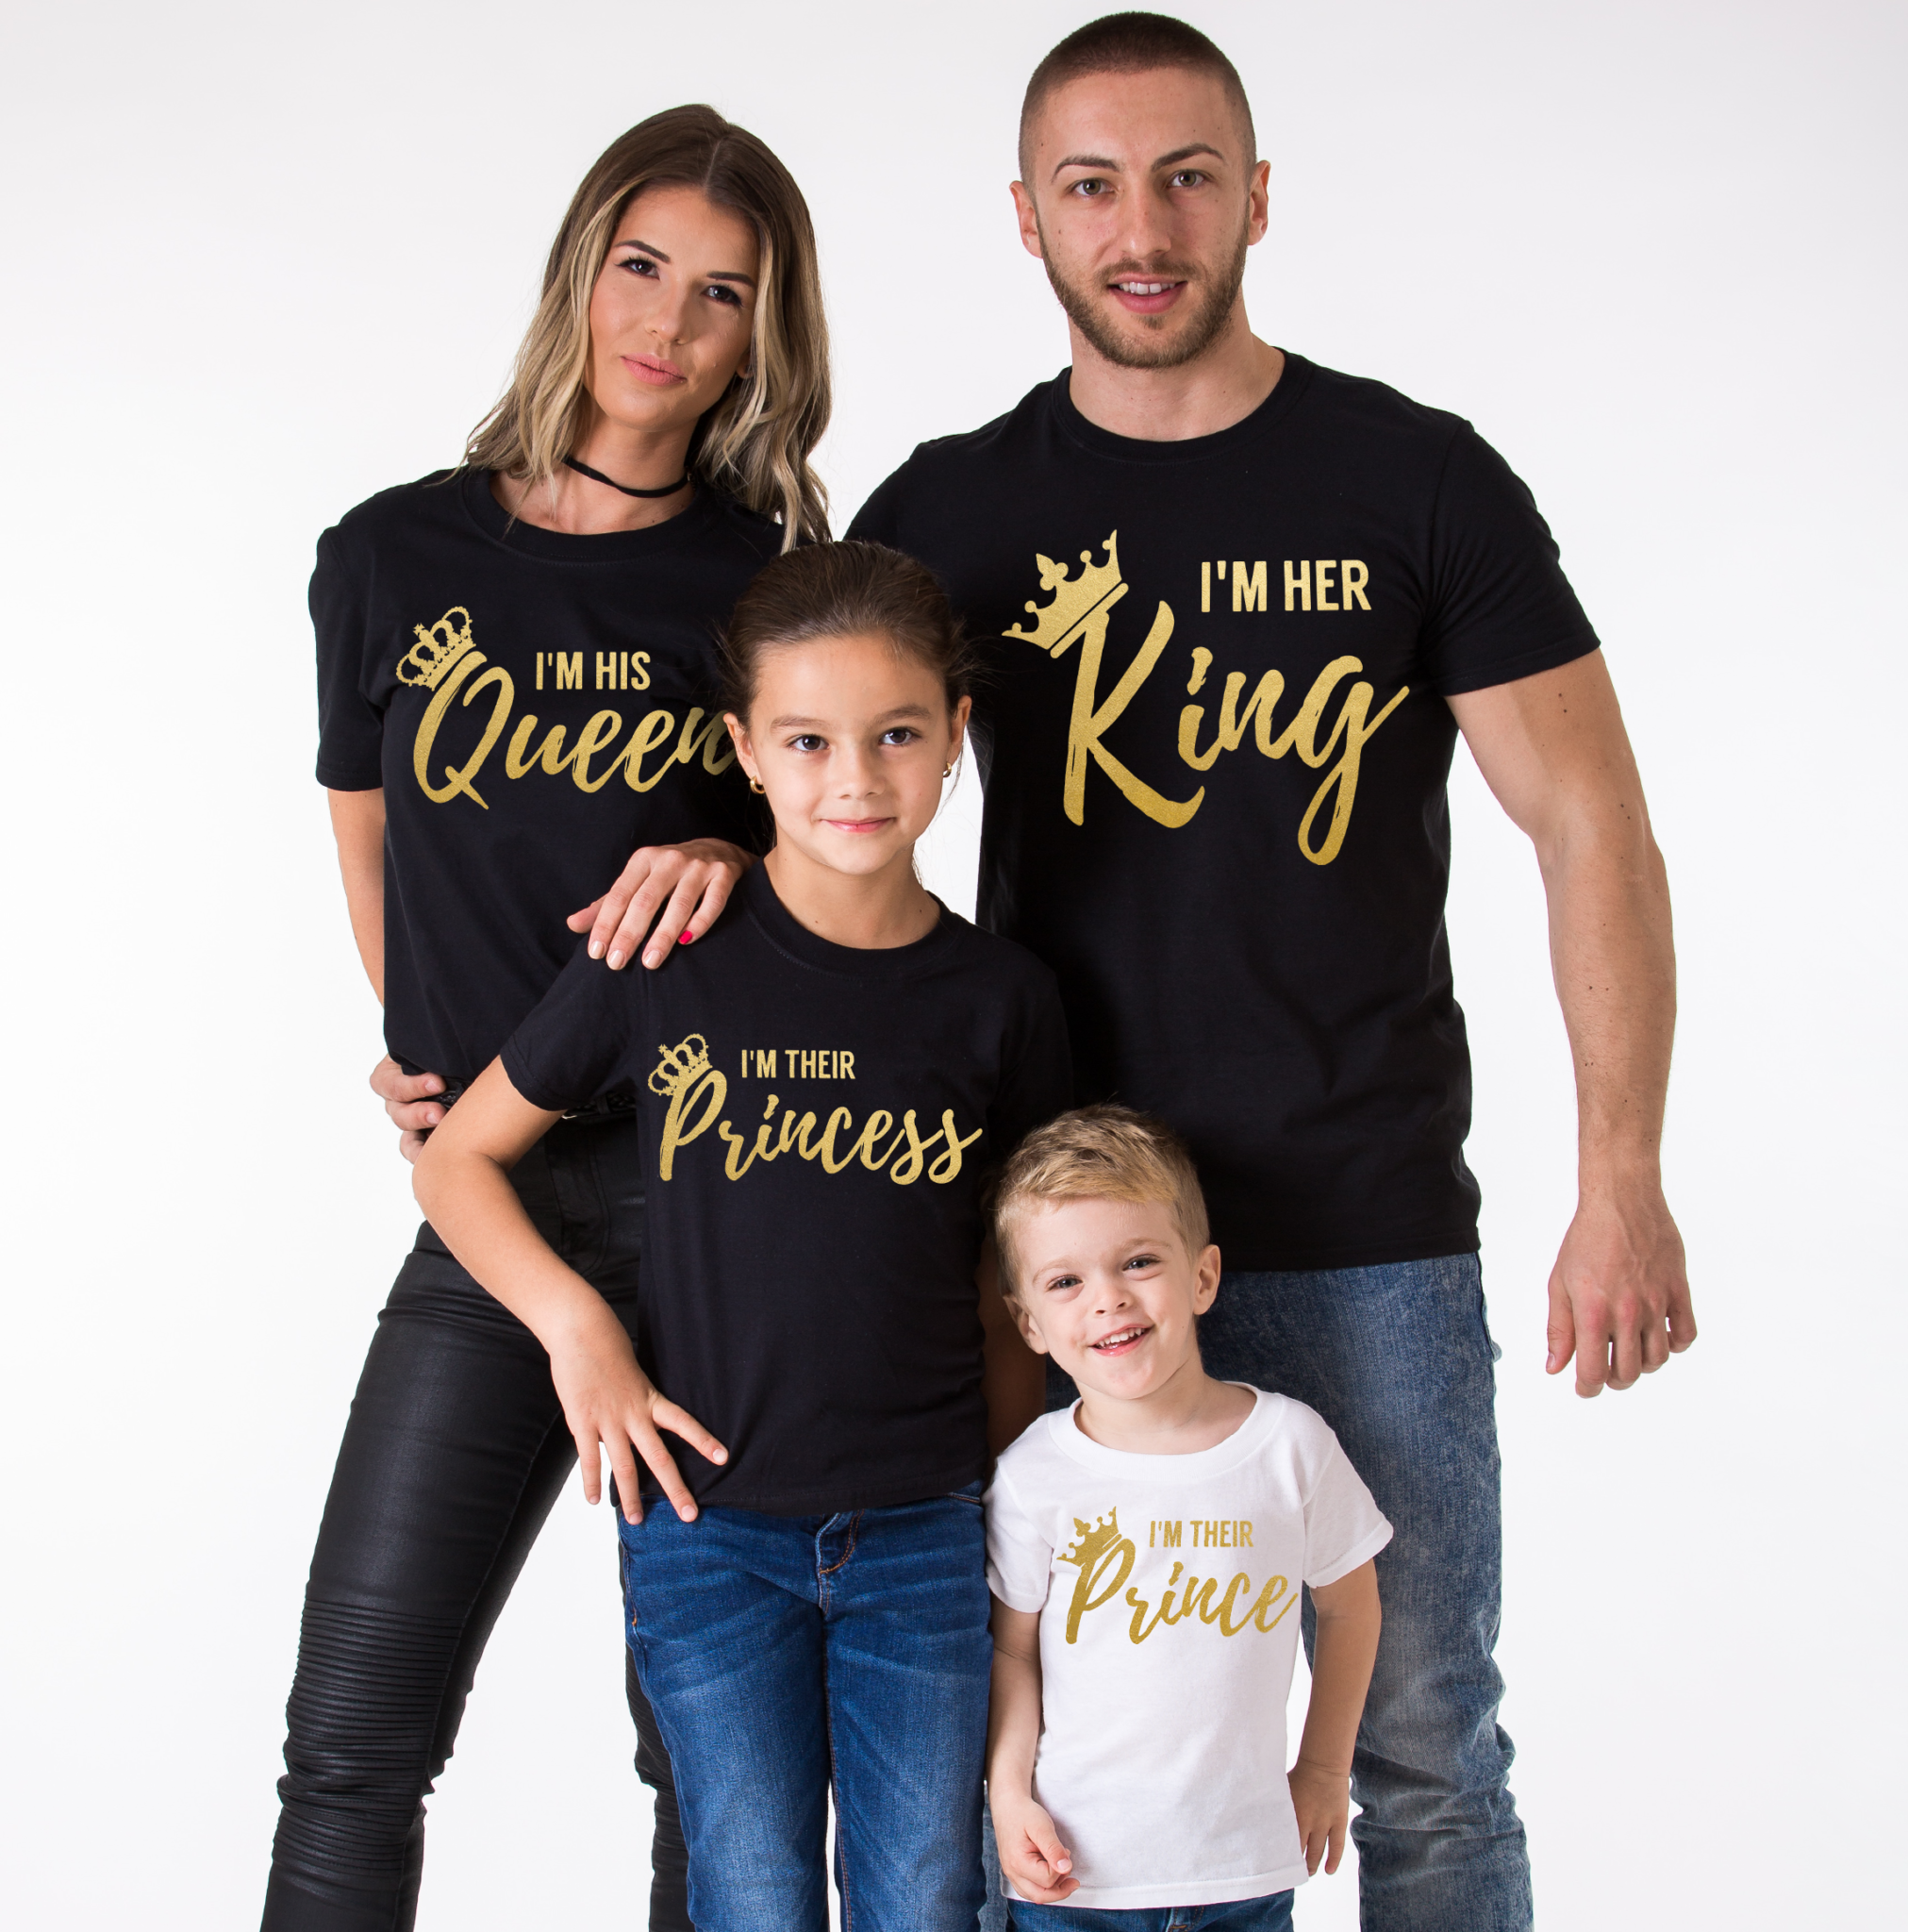 86c0b4ebe31b2 I am Her King, I am His Queen, I am Their Prince, I am Their ...